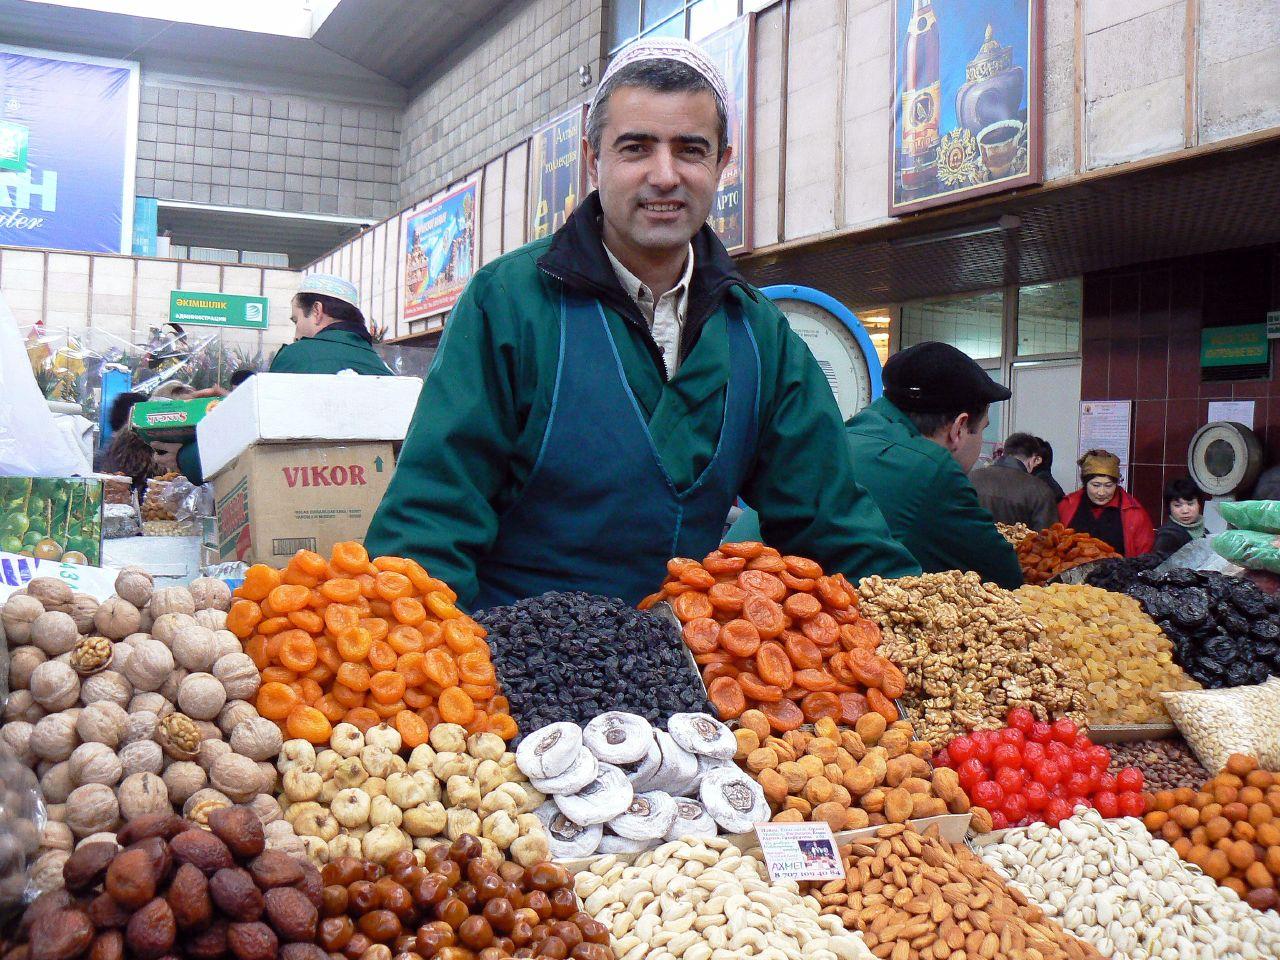 Fruit vendor at the Green Bazaar, Almaty, Kazakhstan